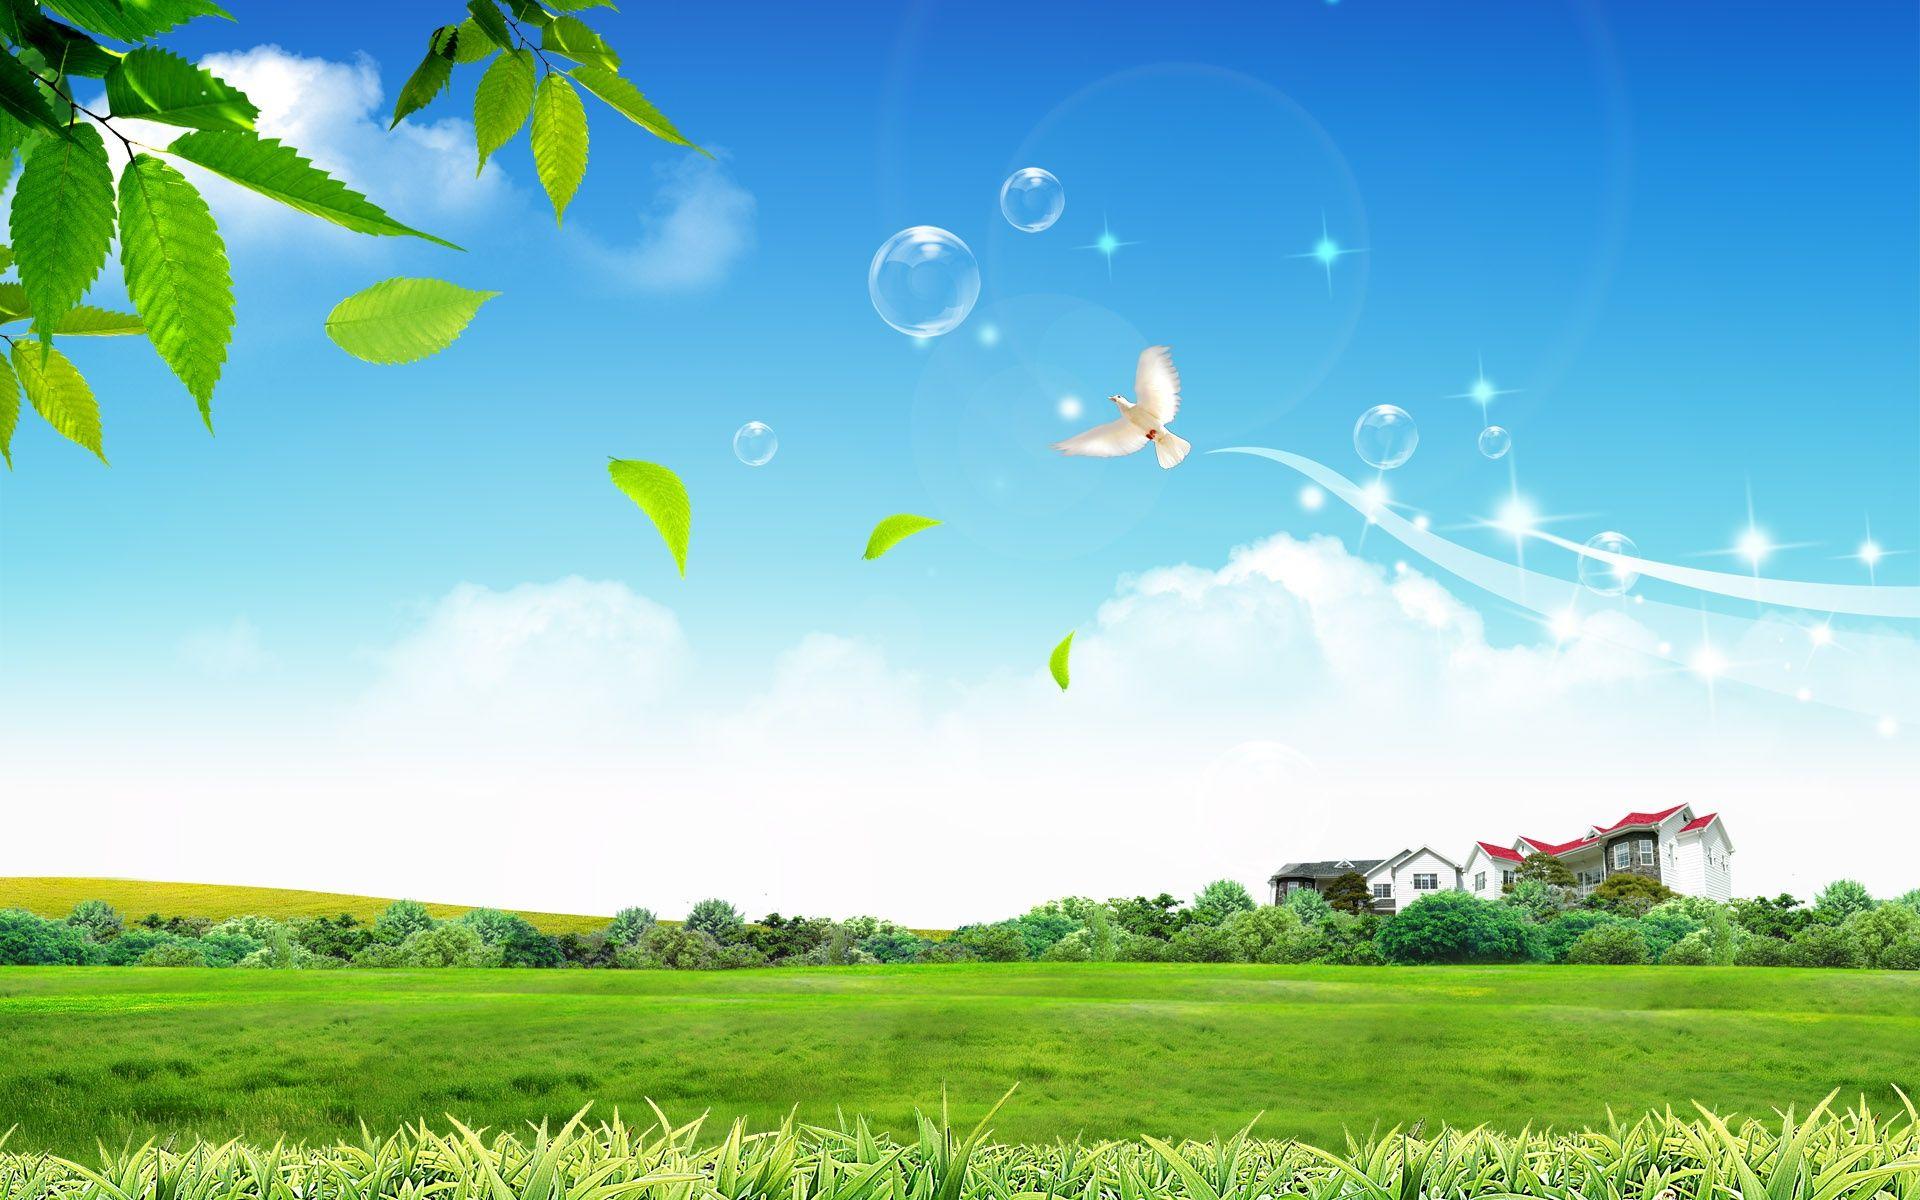 Beautiful Nature Hd Backgrounds Hdpicorner Beautiful Backgrounds Background Hd Wallpaper Beautiful Nature